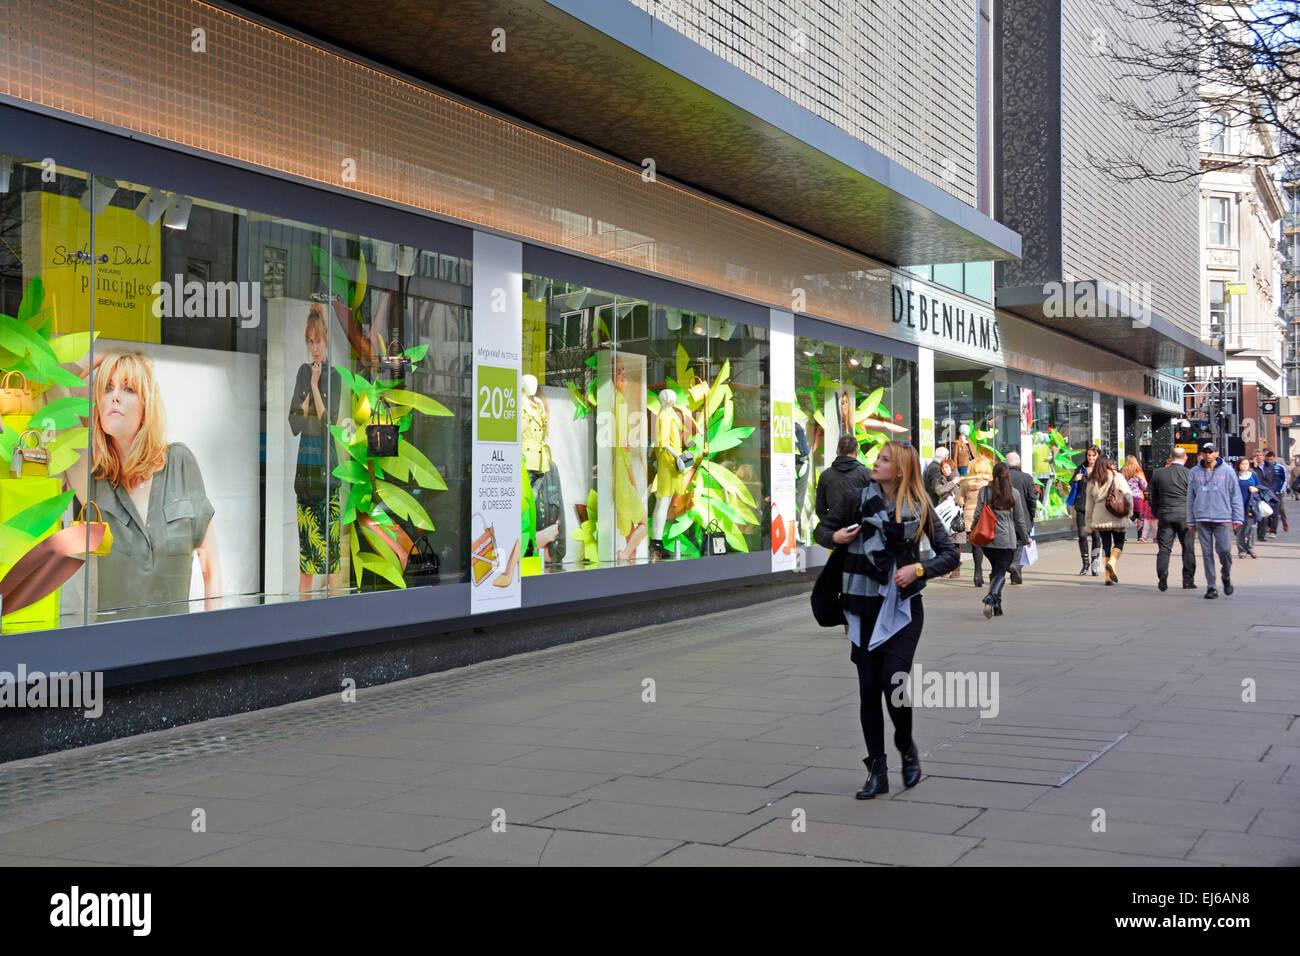 37845e1fd23aa Shoppers outside Debenhams department store in Oxford Street London ...